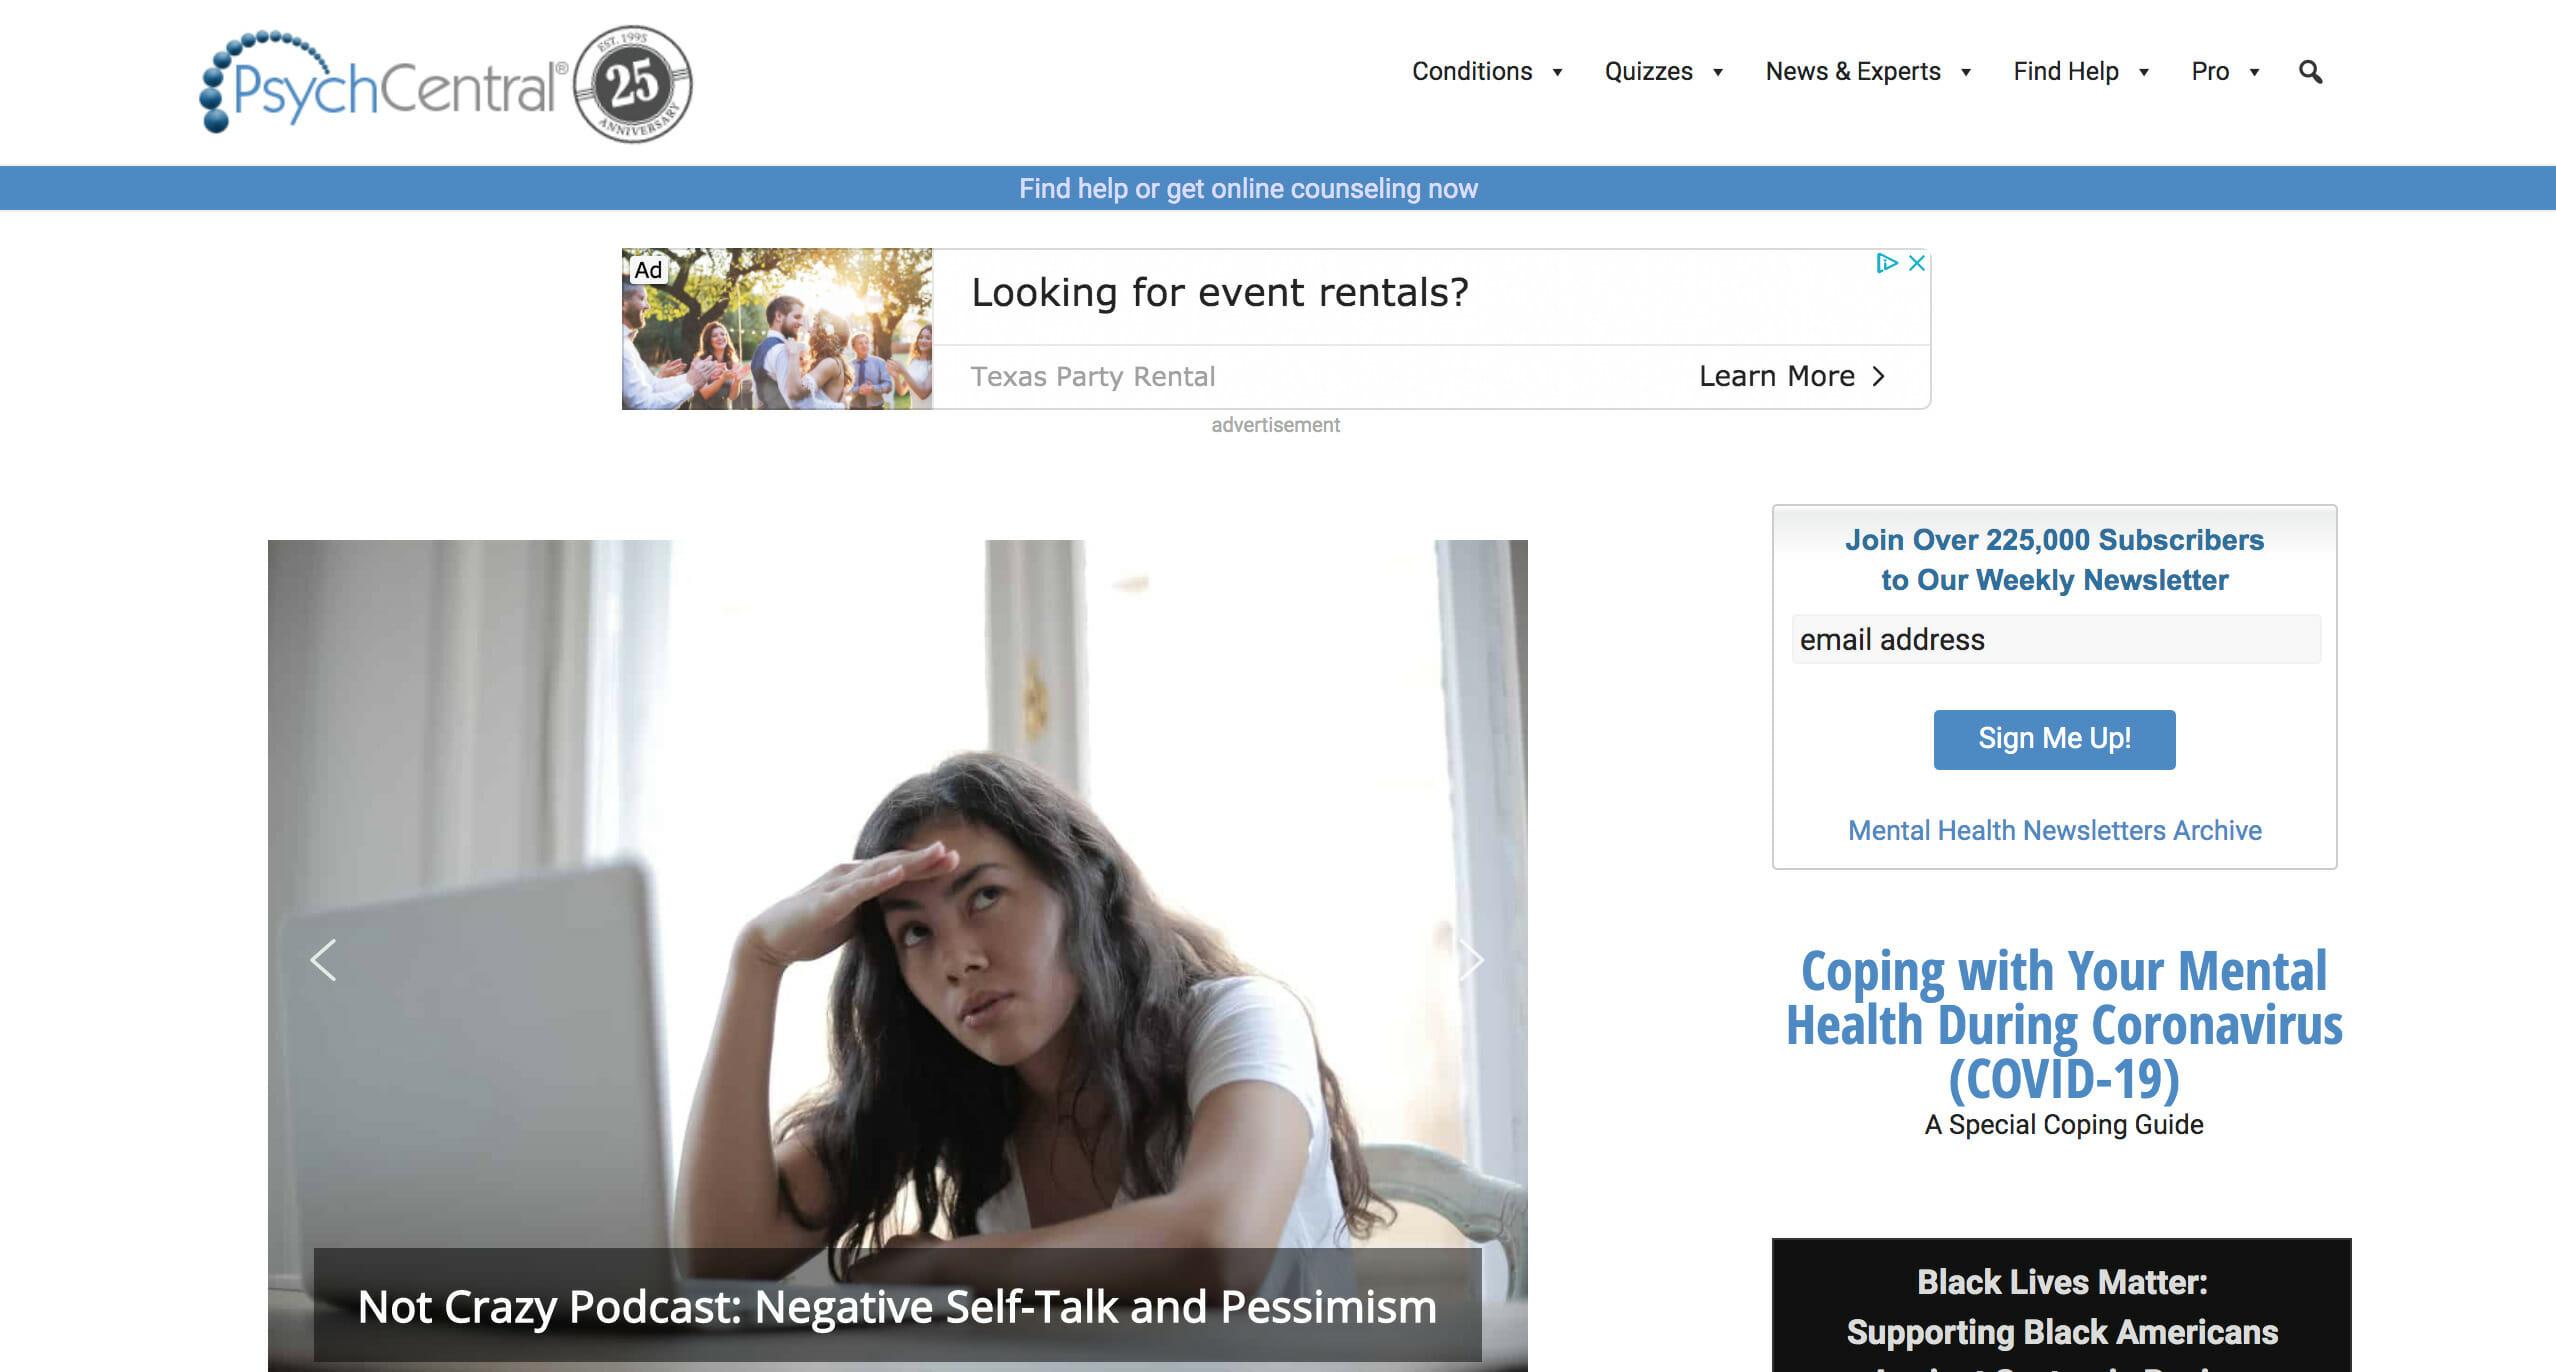 Healthline Media acquires PsychCentral